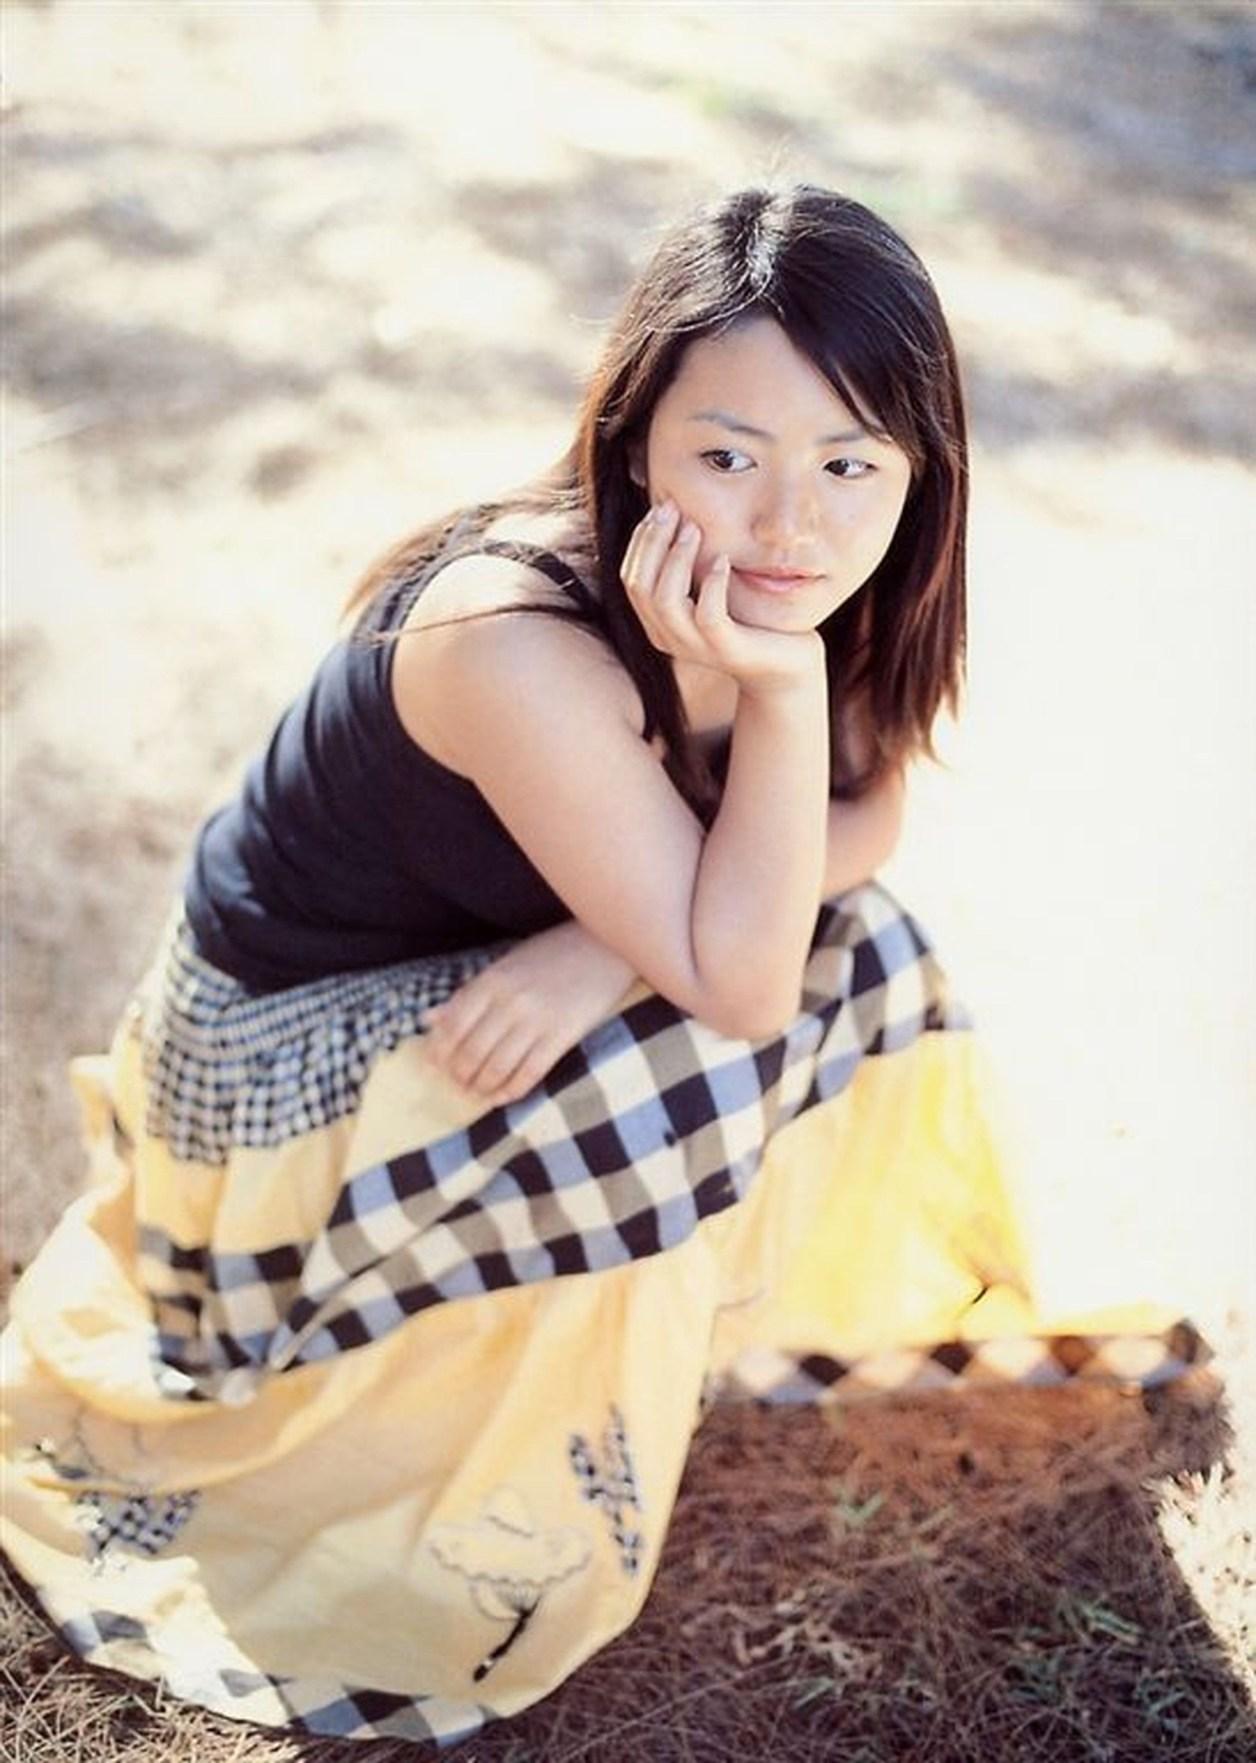 Isoyama-Sayaka-photobook-pre-pri-17-084